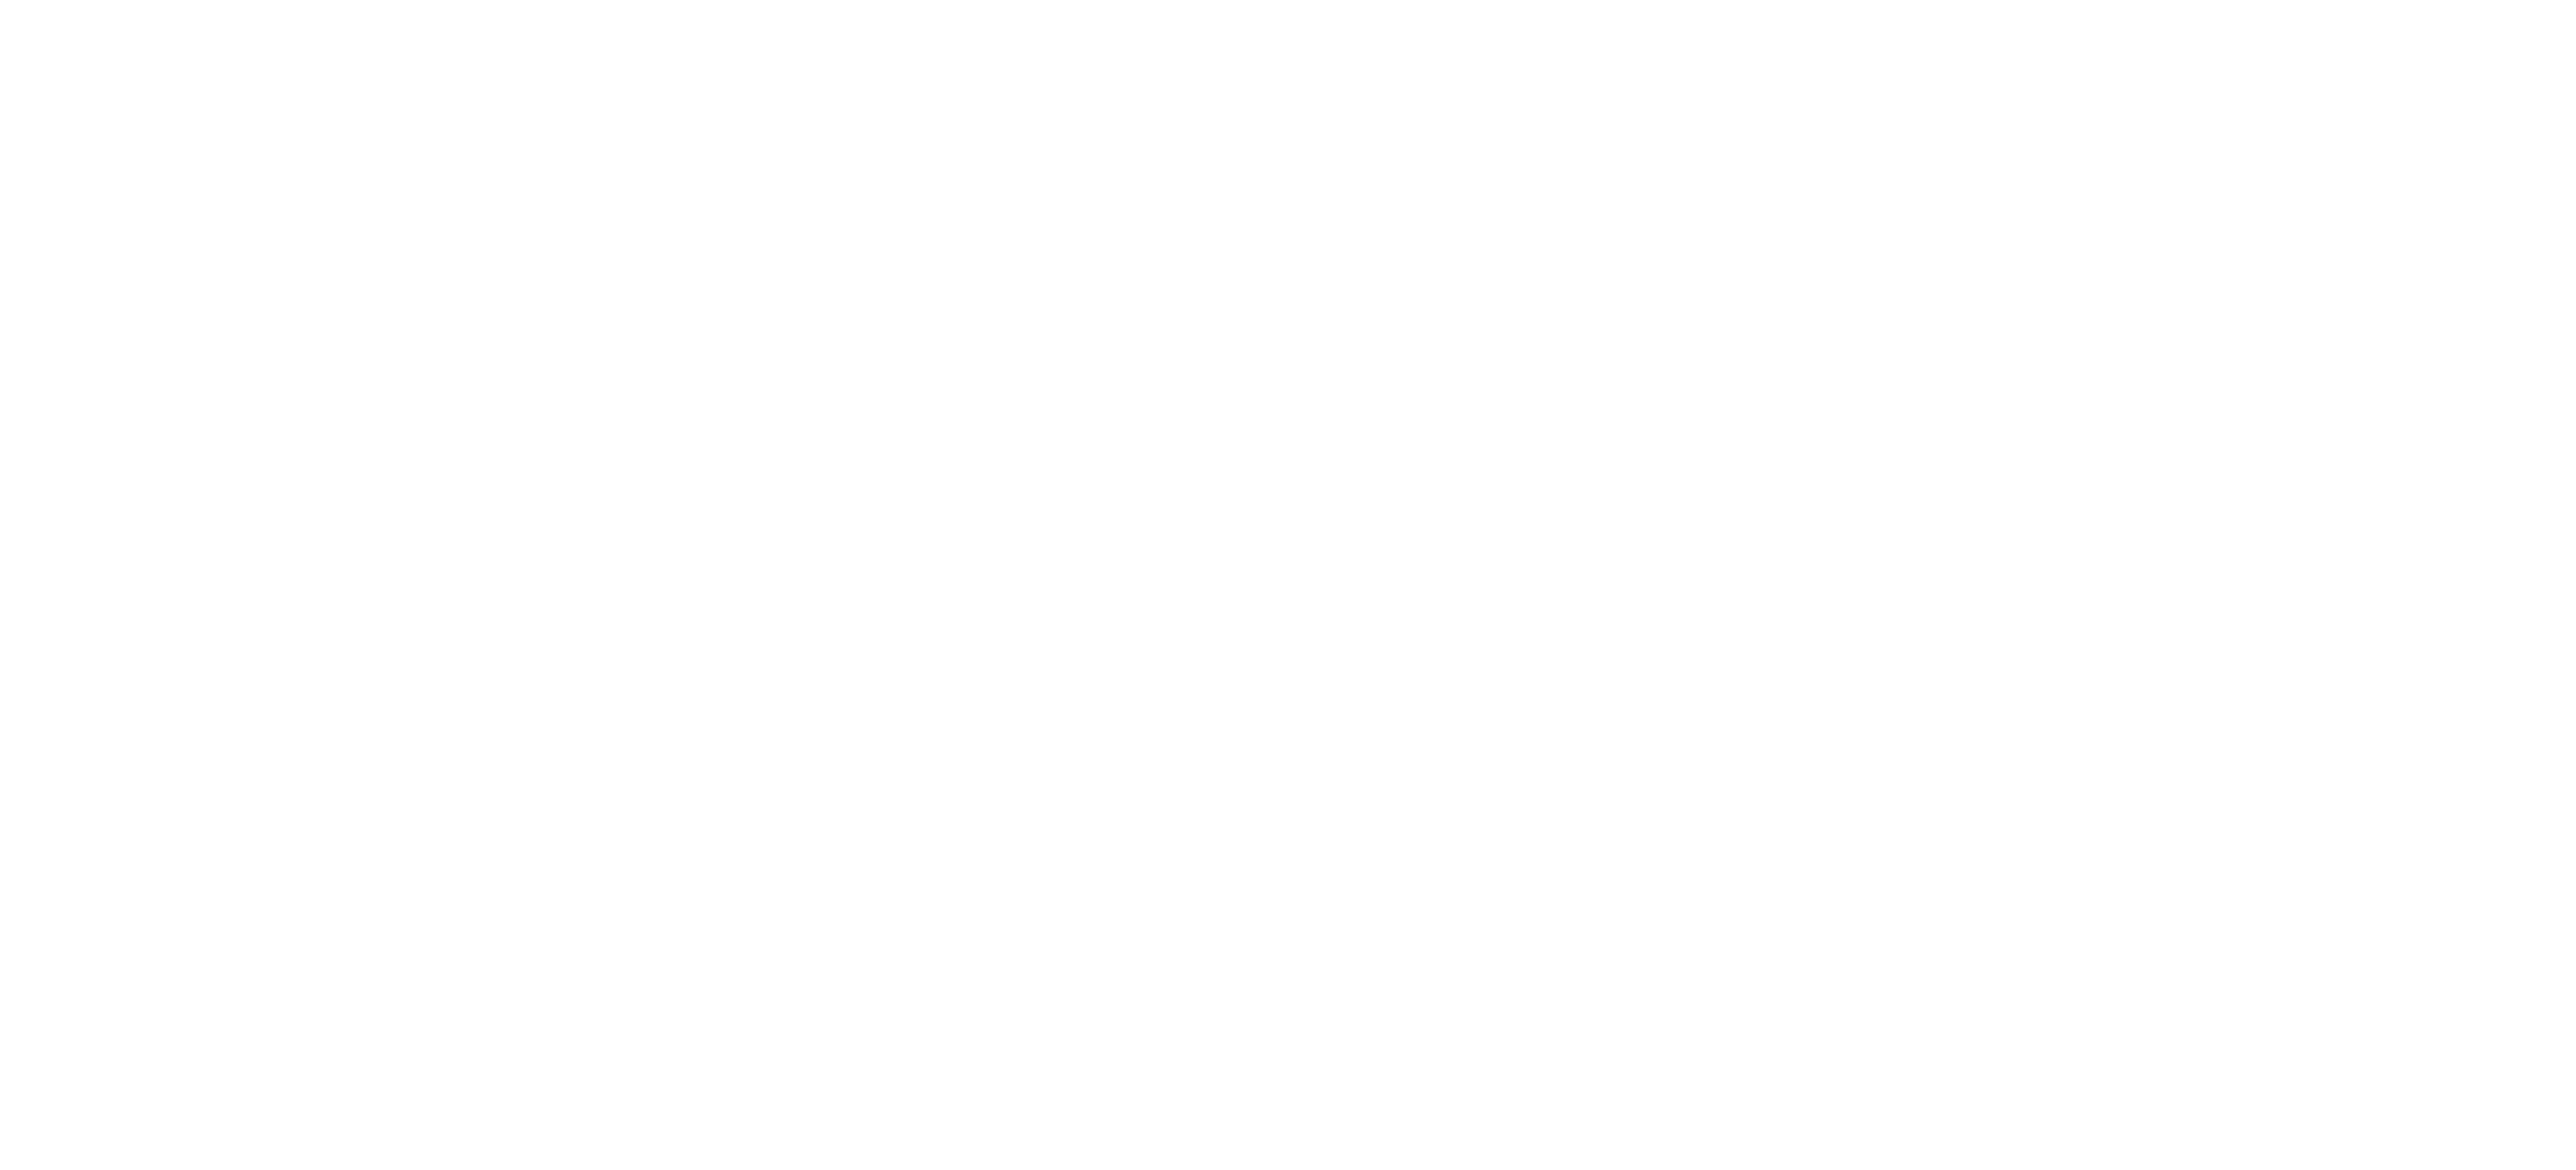 Viki Gonia Photography logo